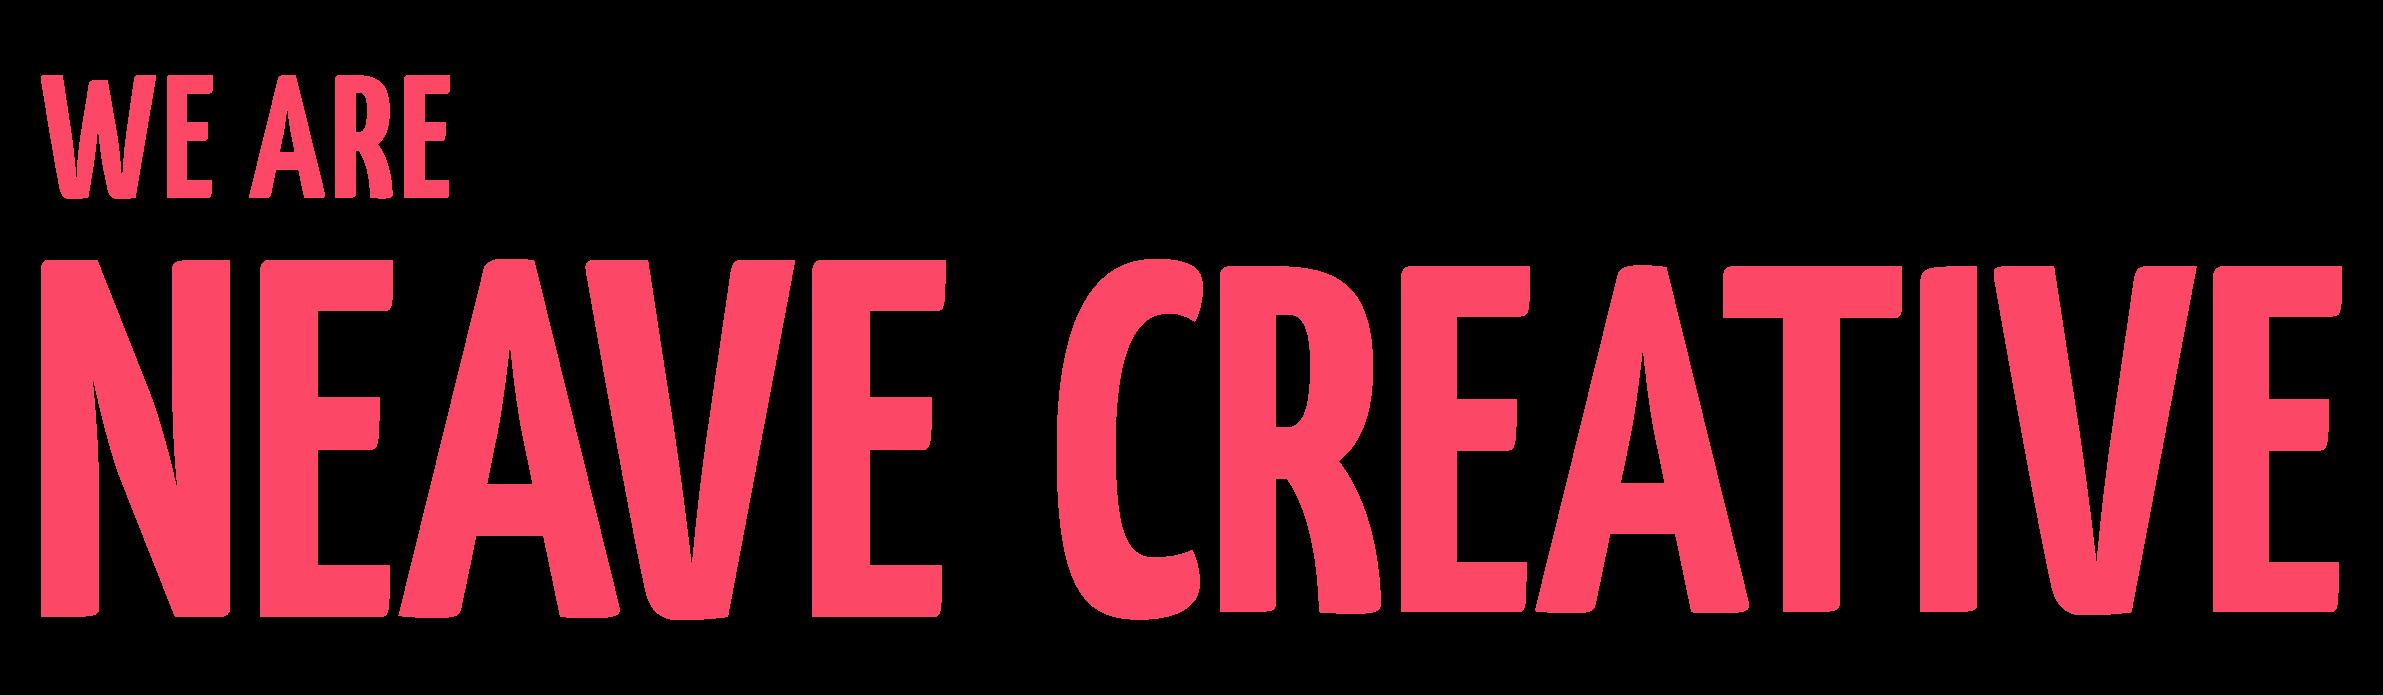 Neave Creative